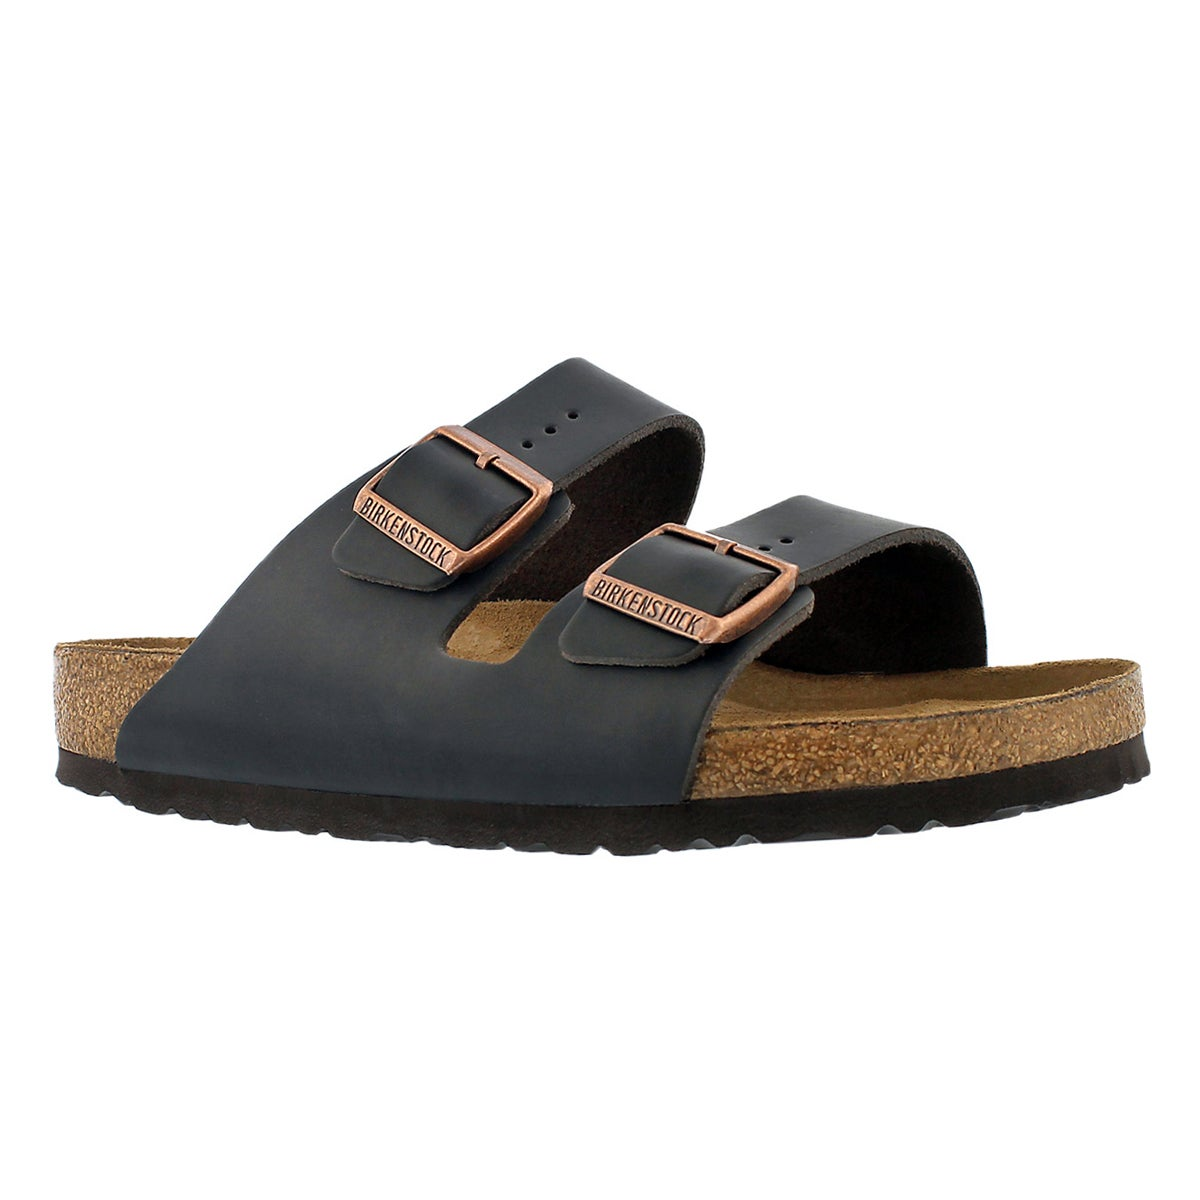 Men's ARIZONA soft footbed brown 2 strap sandals